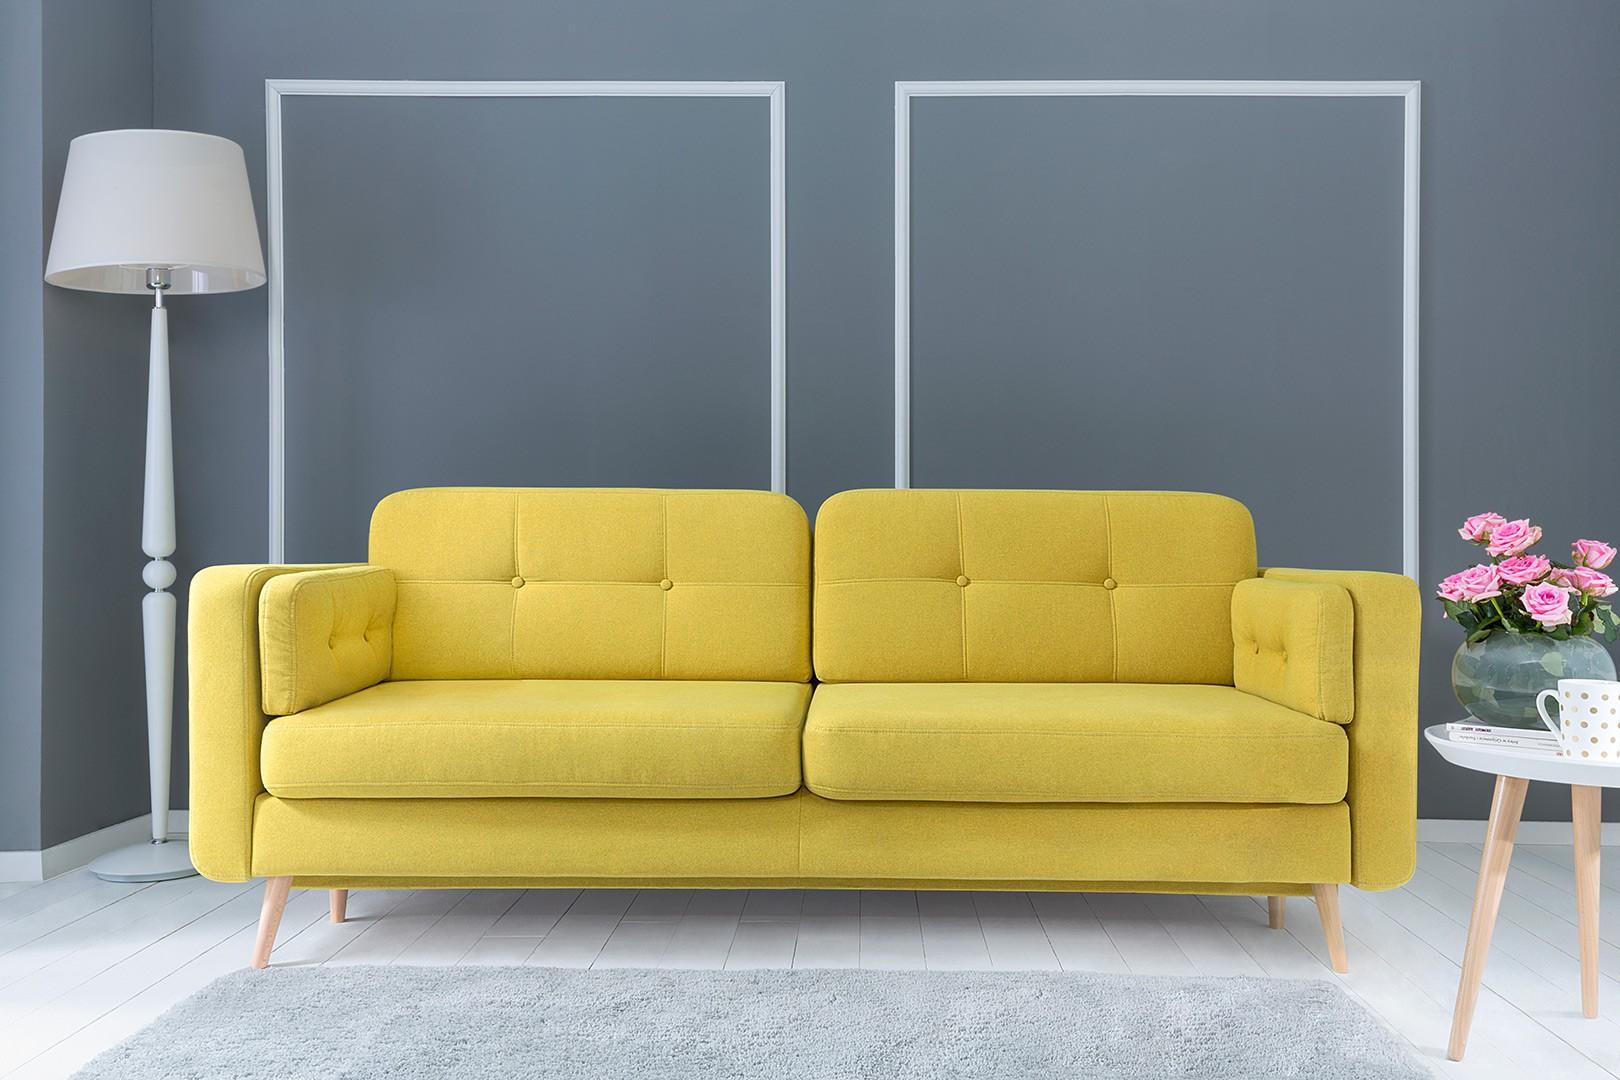 Sofa Cornet firmy Black Red White. Fot. Black Red White